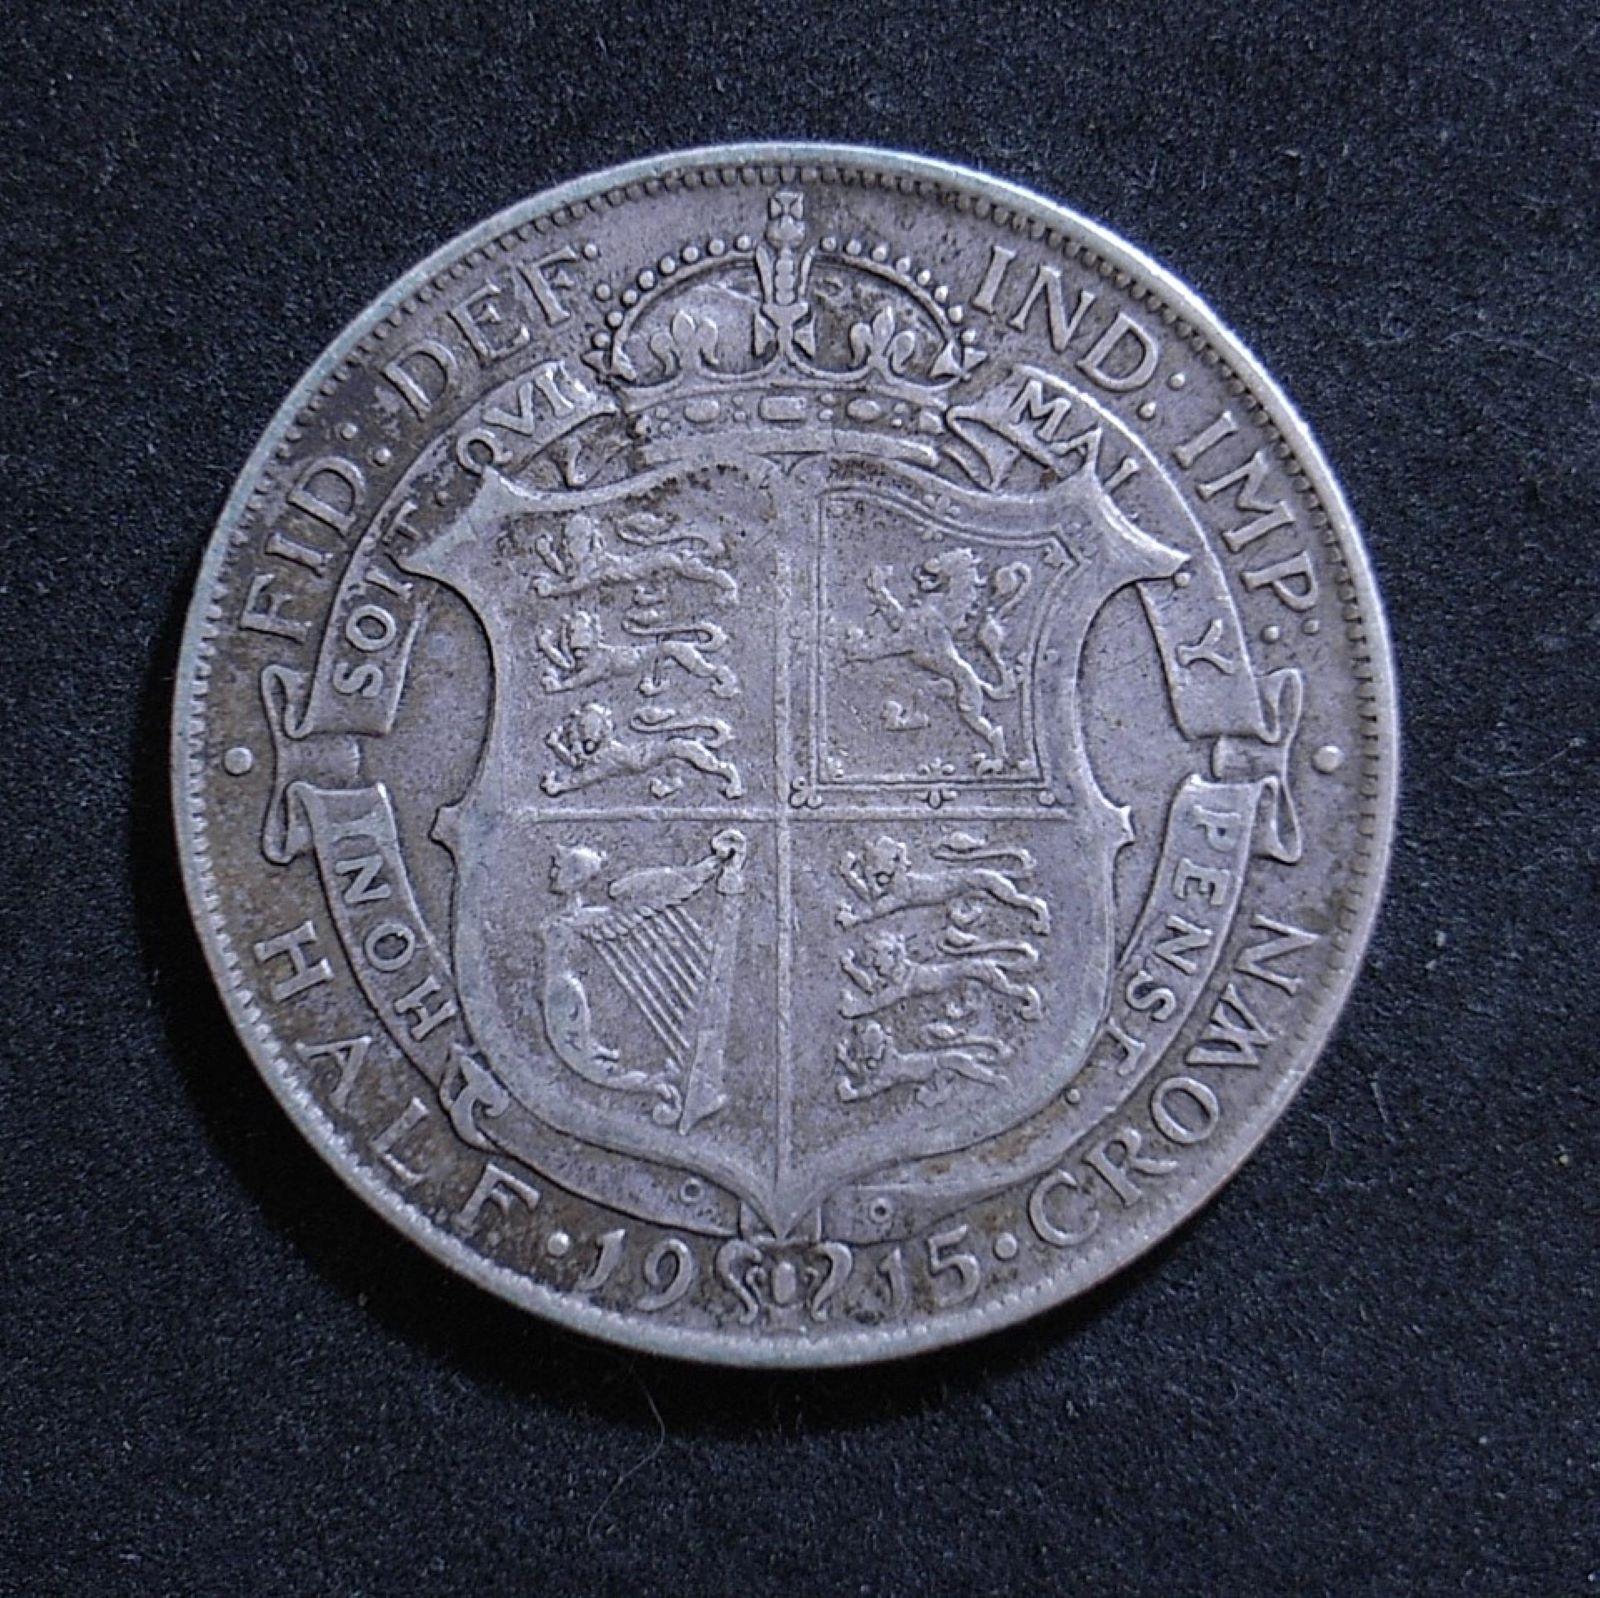 UK Half Crown 1915 rev 1